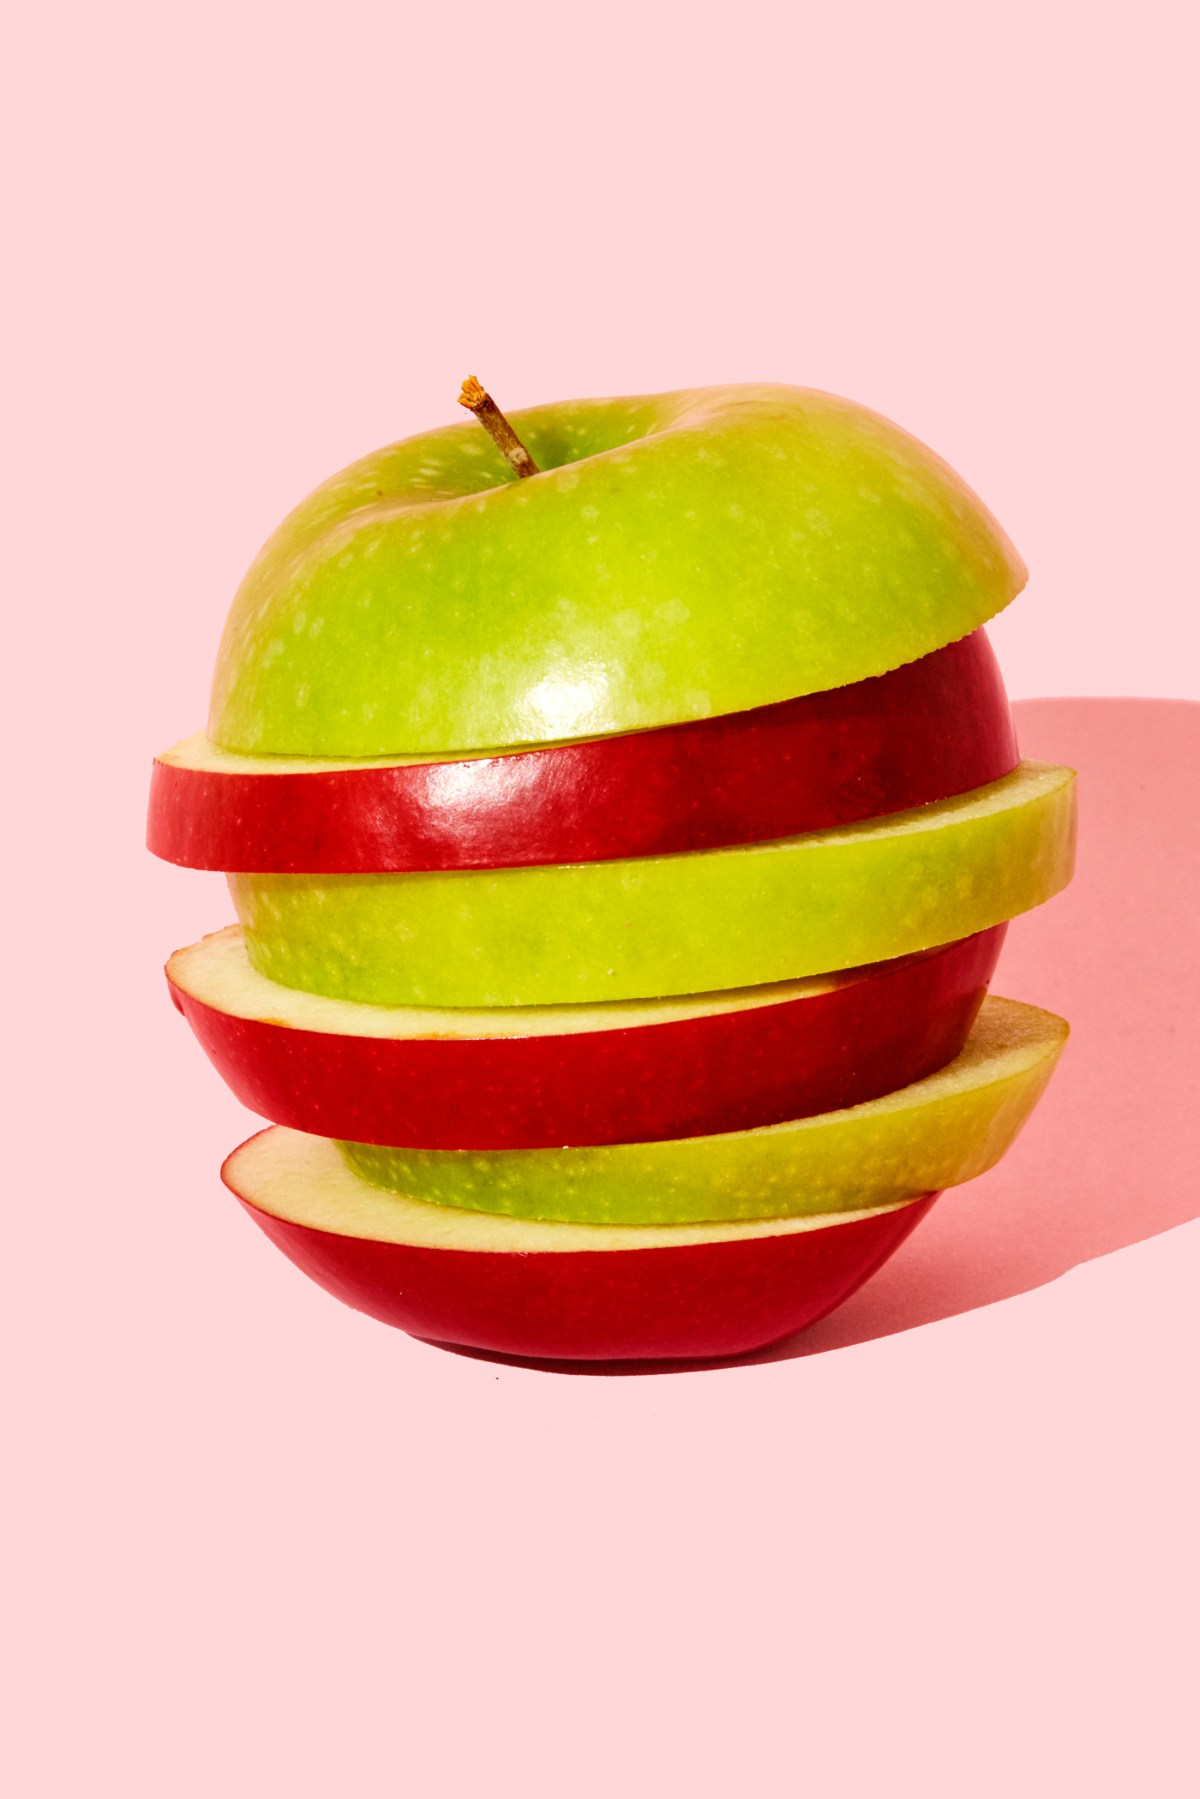 50 healthiest foods apple